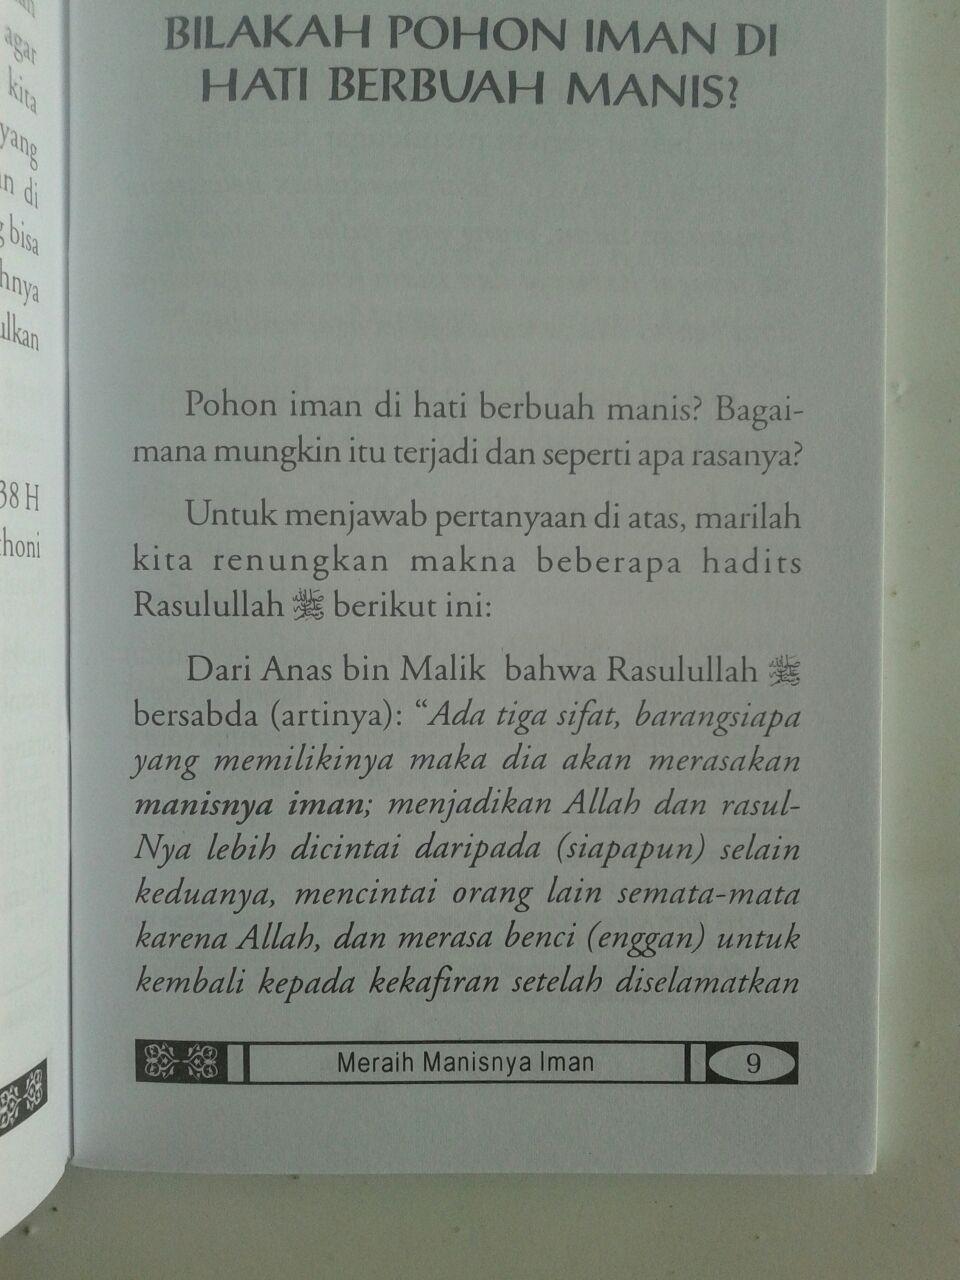 Buku Saku Meraih Manisnya Iman isi